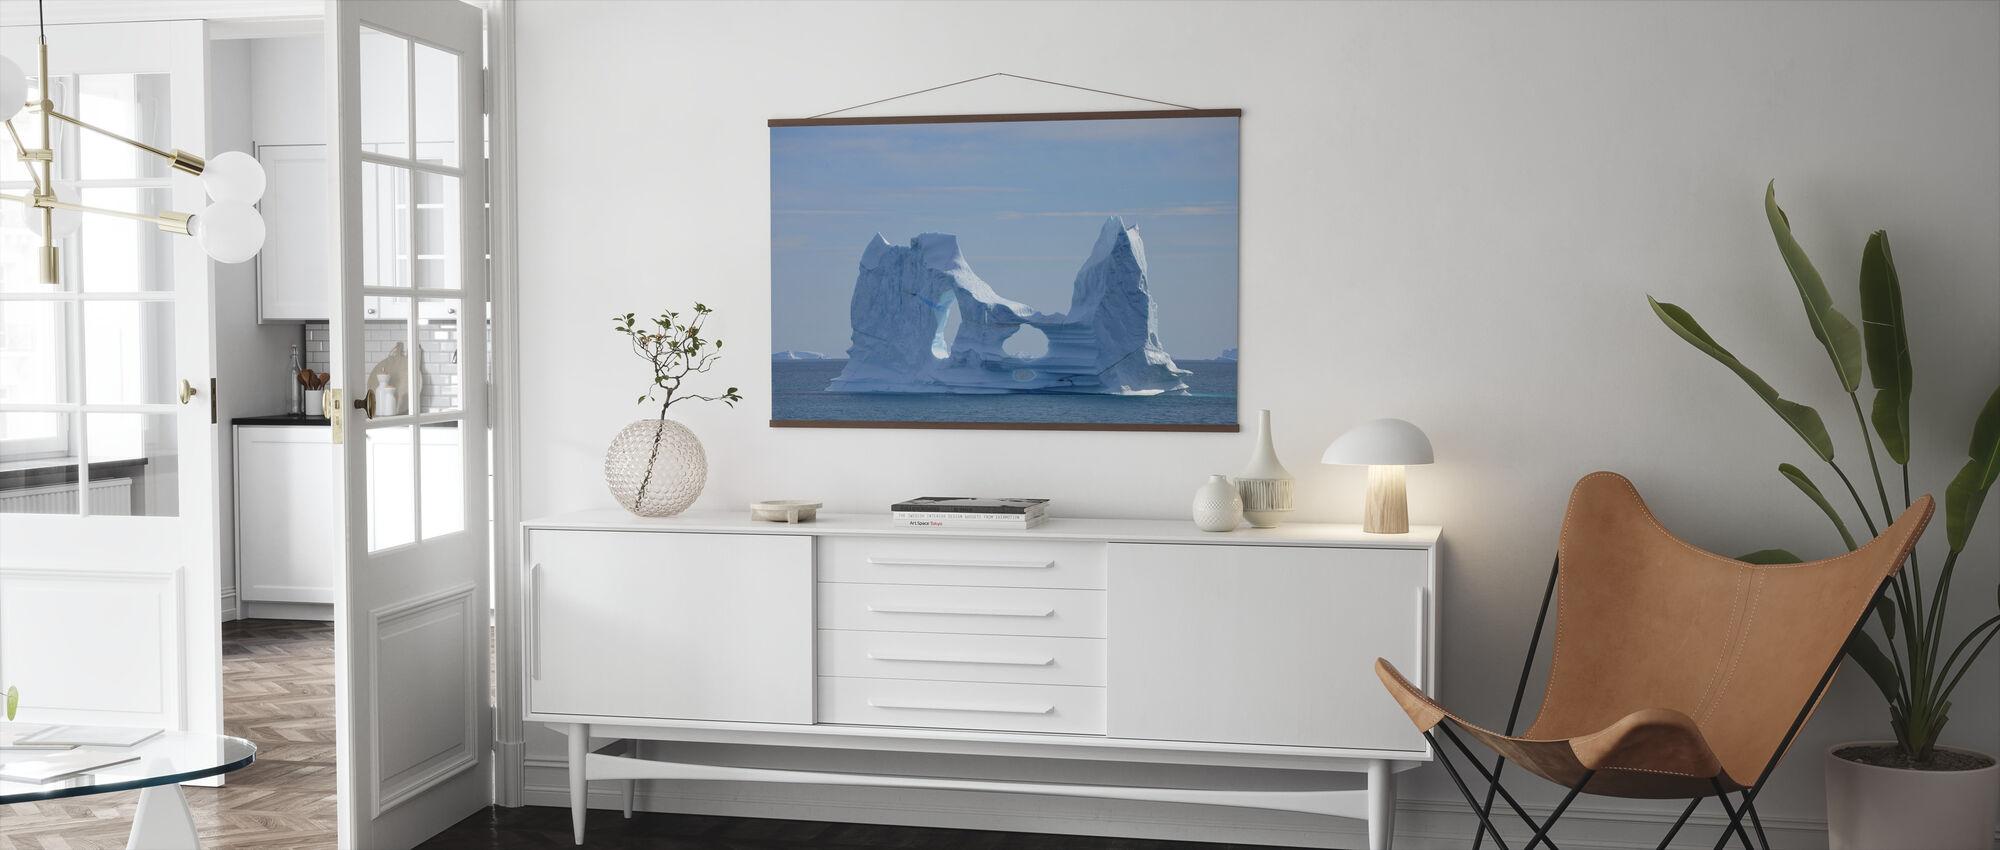 Floating Greenland - Poster - Living Room